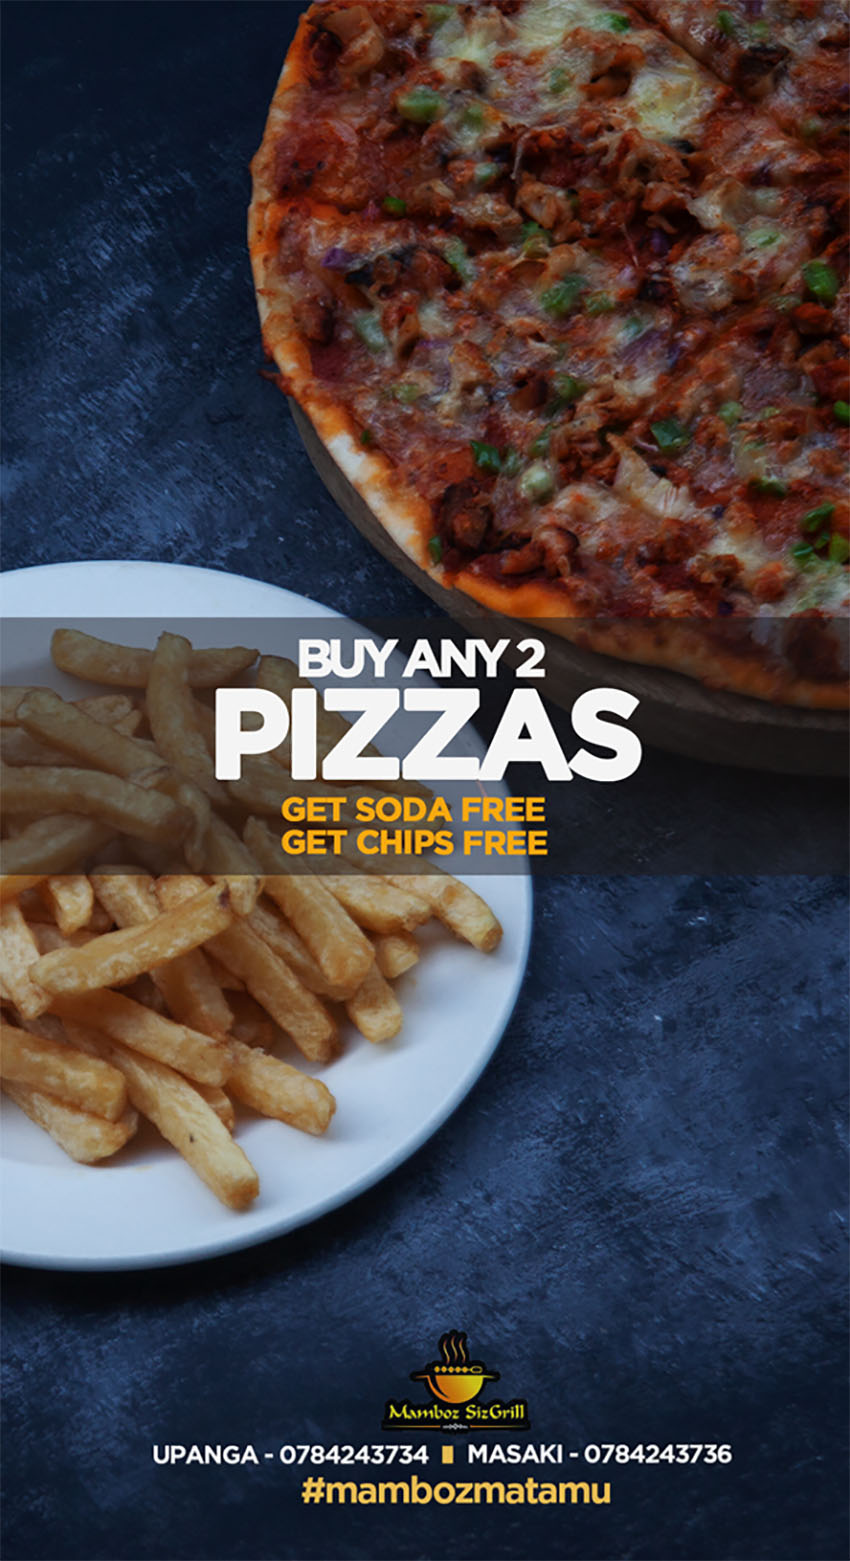 Mamboz Sizgrill Pizza offer